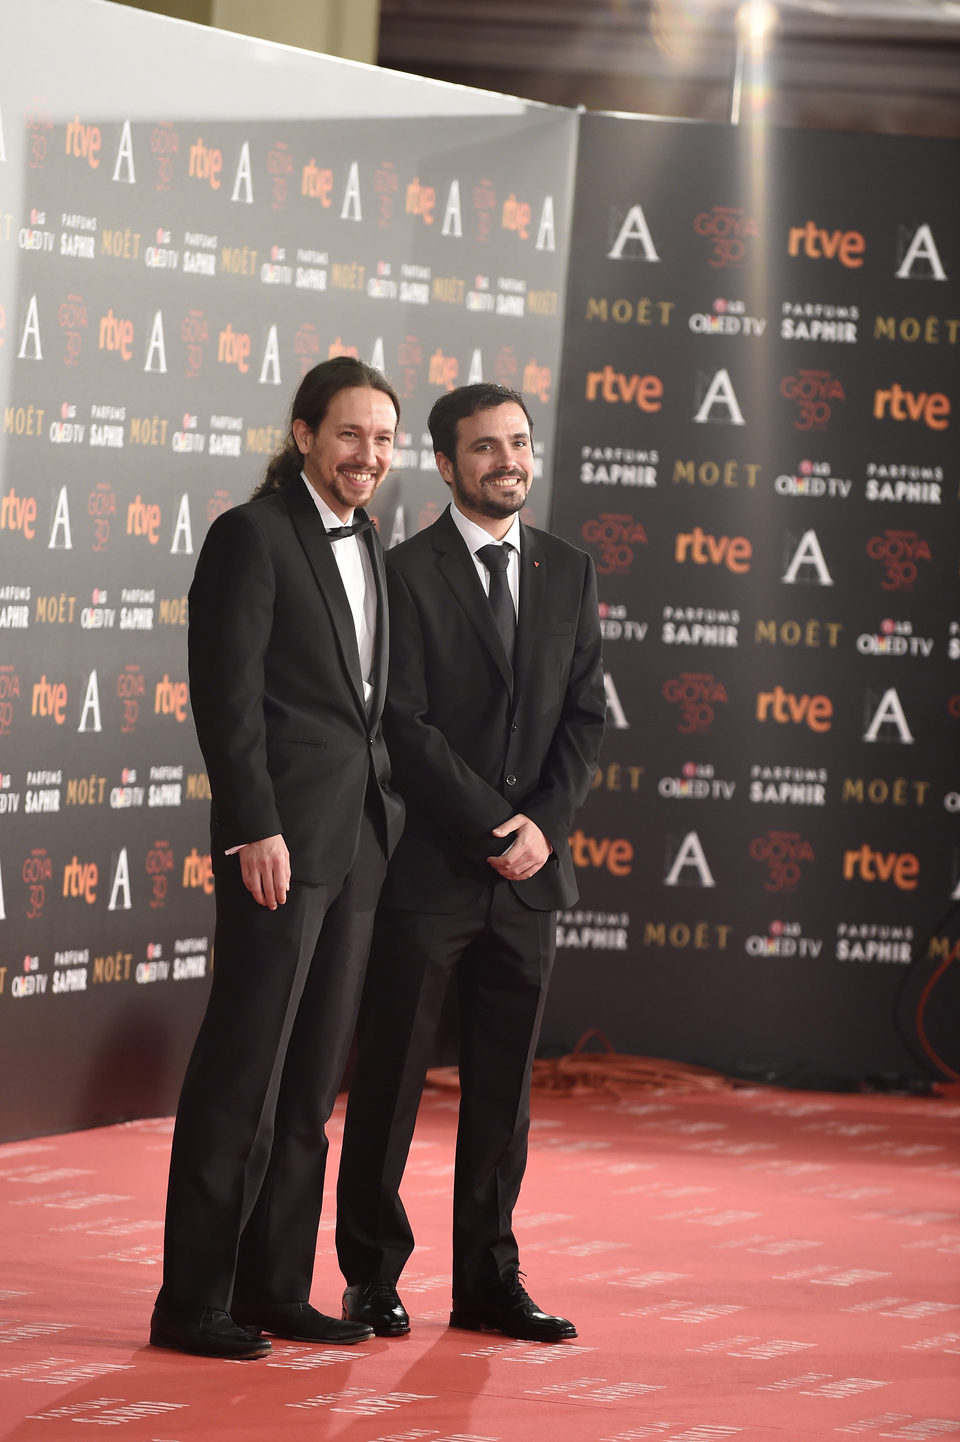 ¿Cuánto mide Alberto Garzón? - Altura 65431_pablo-iglesias-alberto-garzon-alfombra-roja-premios-goya-2016